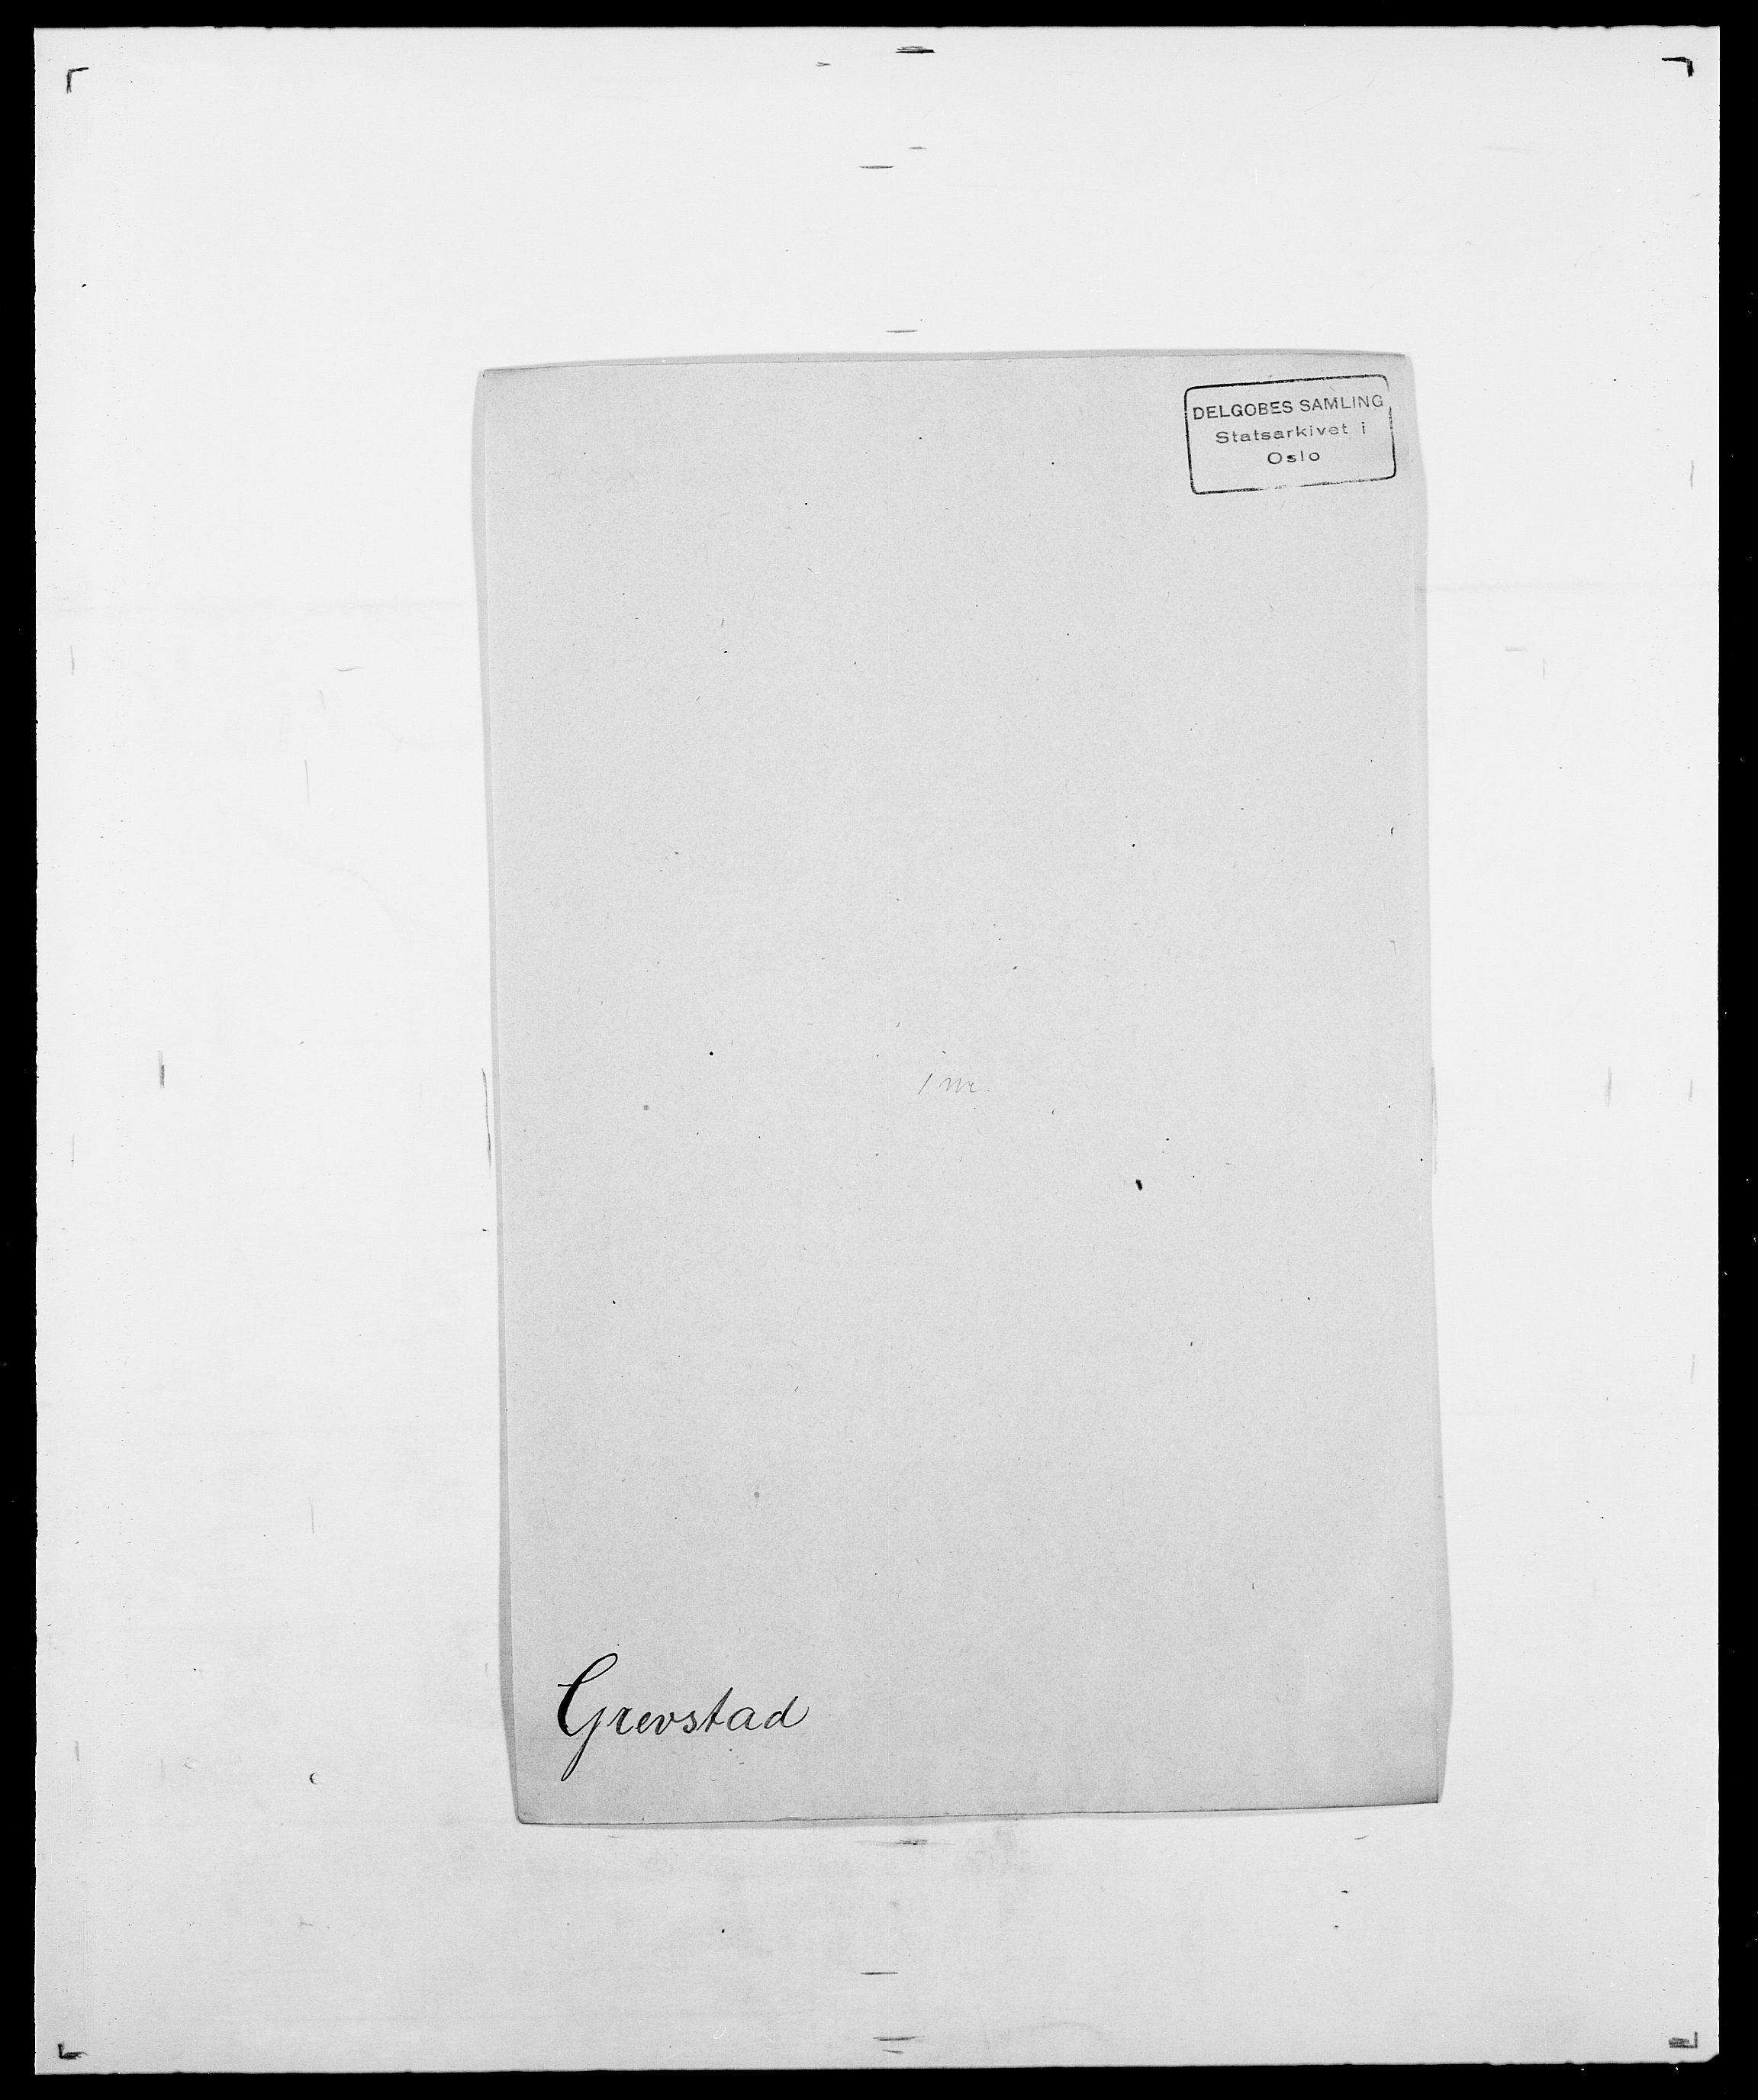 SAO, Delgobe, Charles Antoine - samling, D/Da/L0014: Giebdhausen - Grip, s. 639